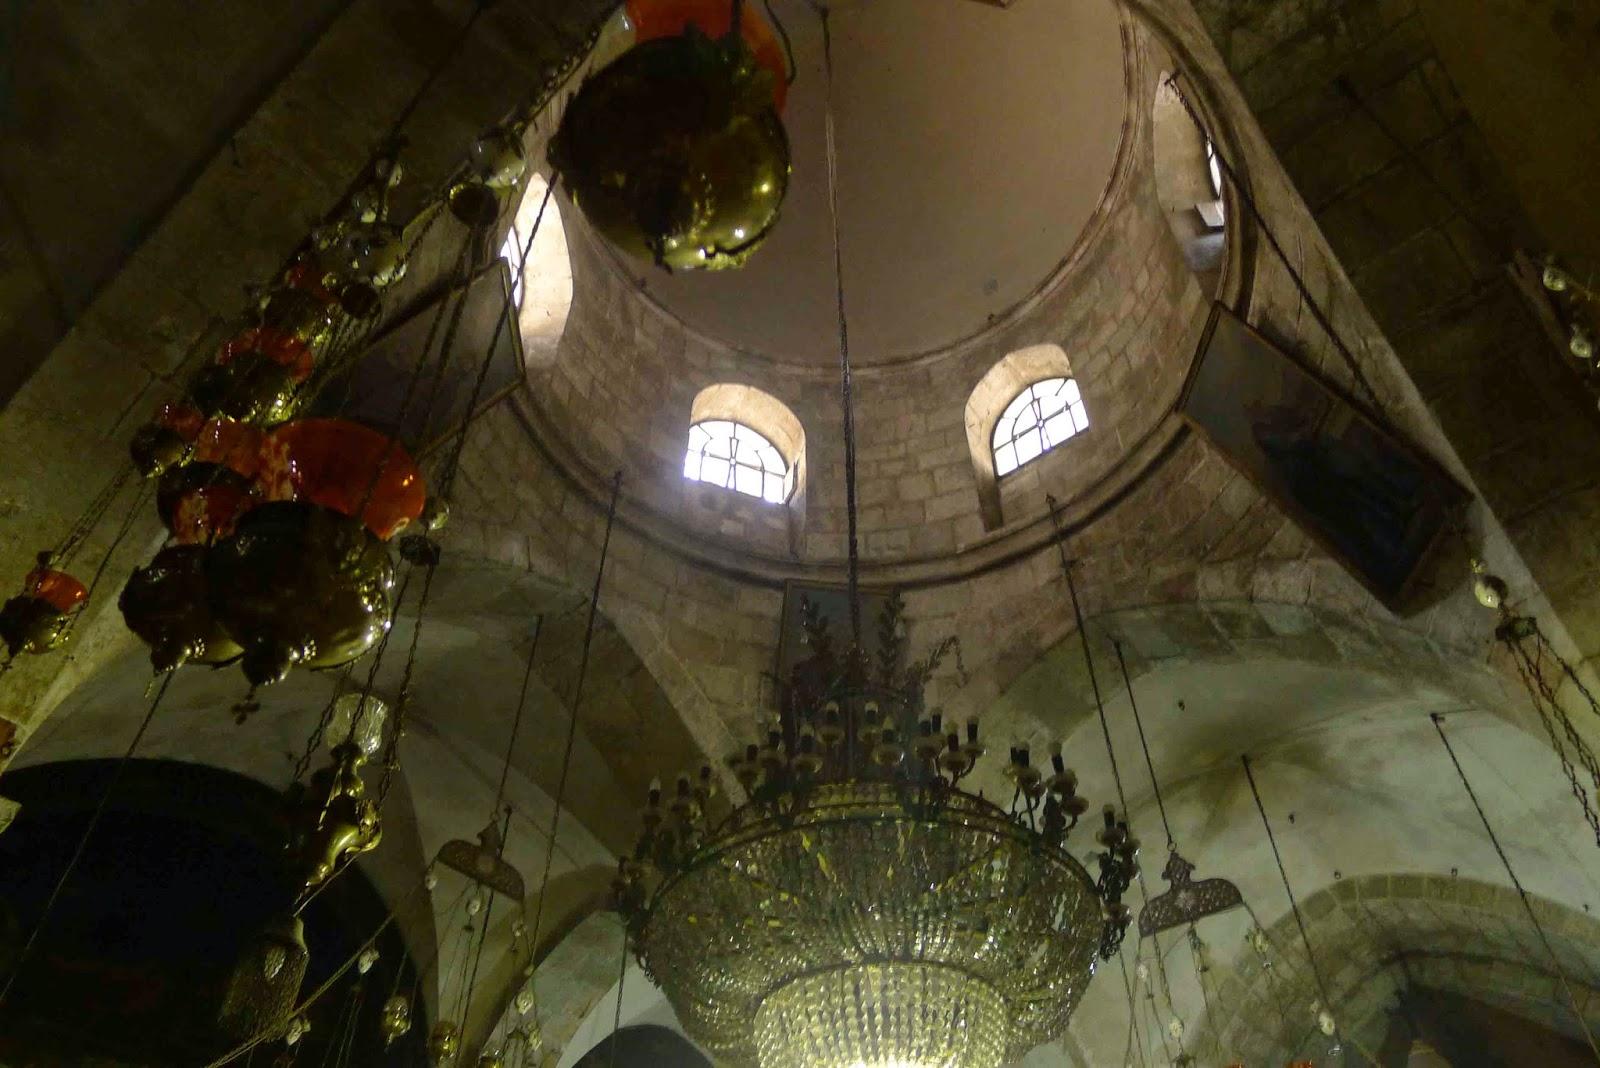 Chapel of St. Helena